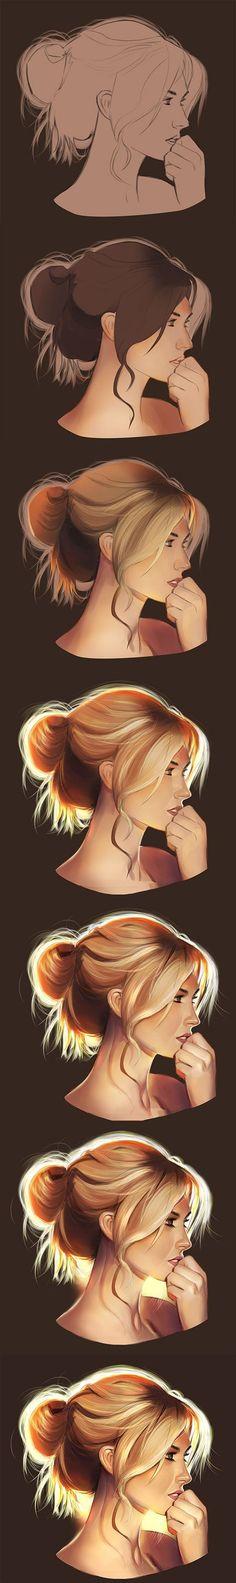 rostro femenino